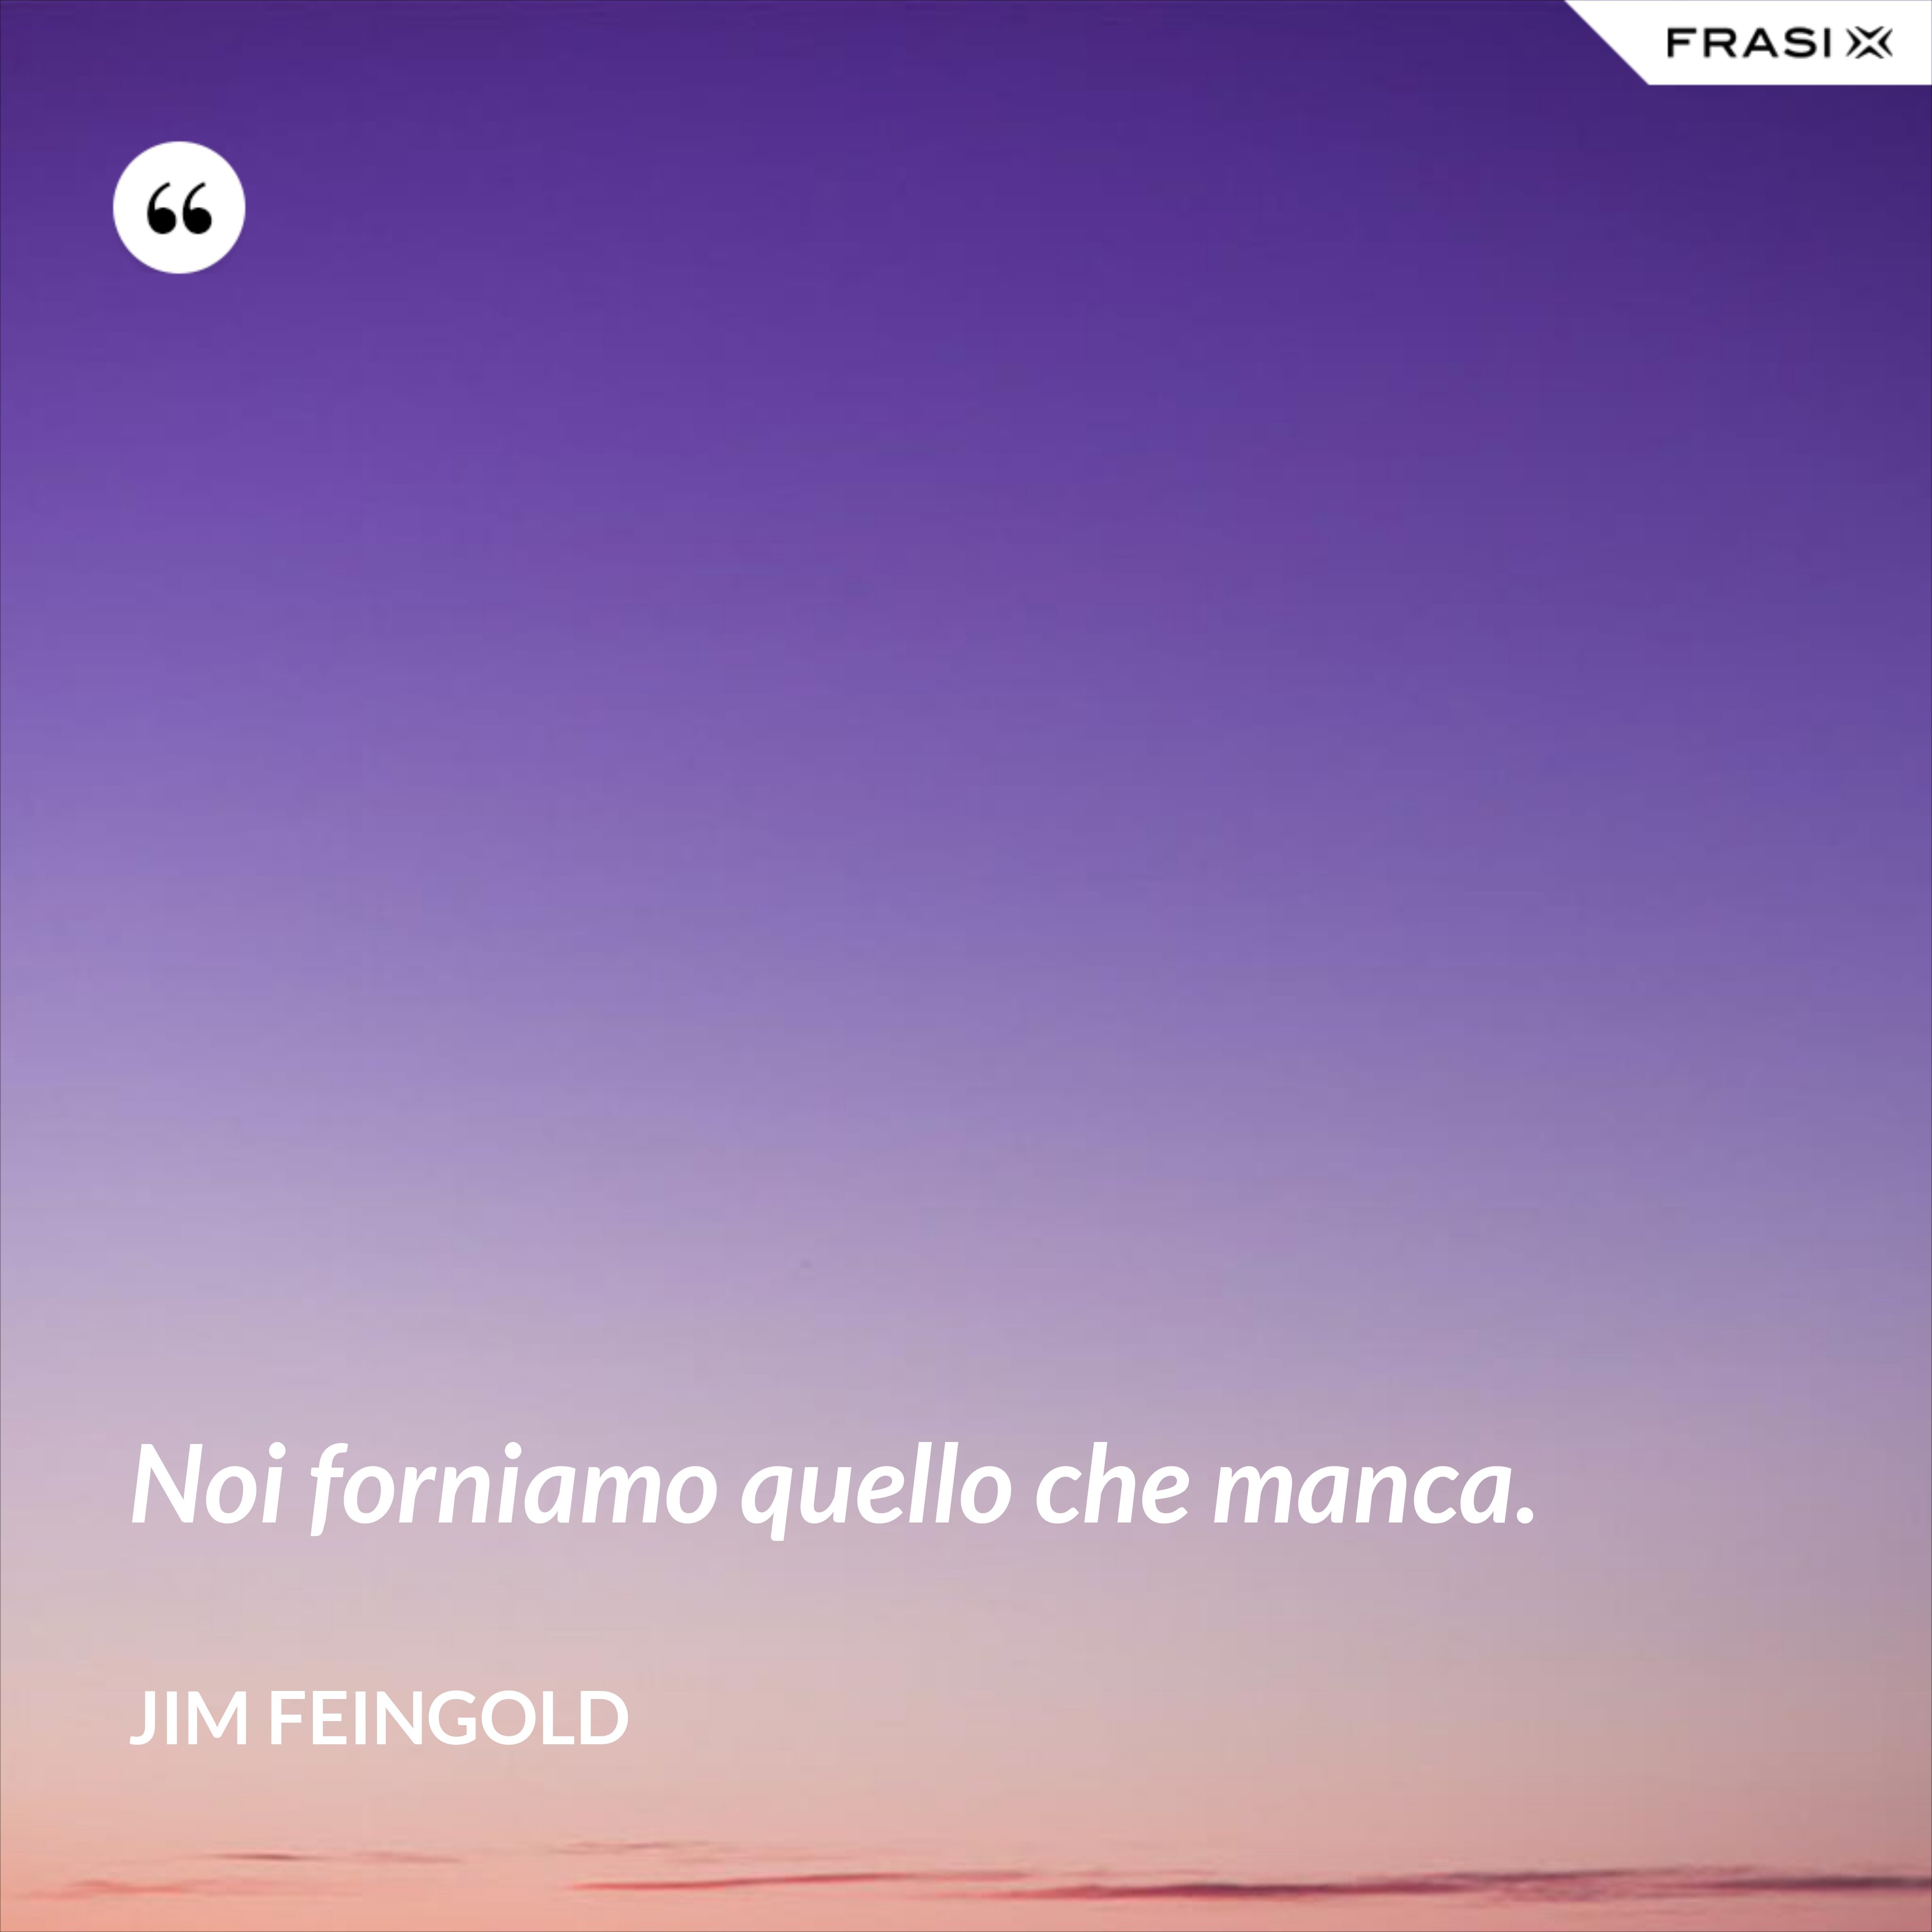 Noi forniamo quello che manca. - Jim Feingold